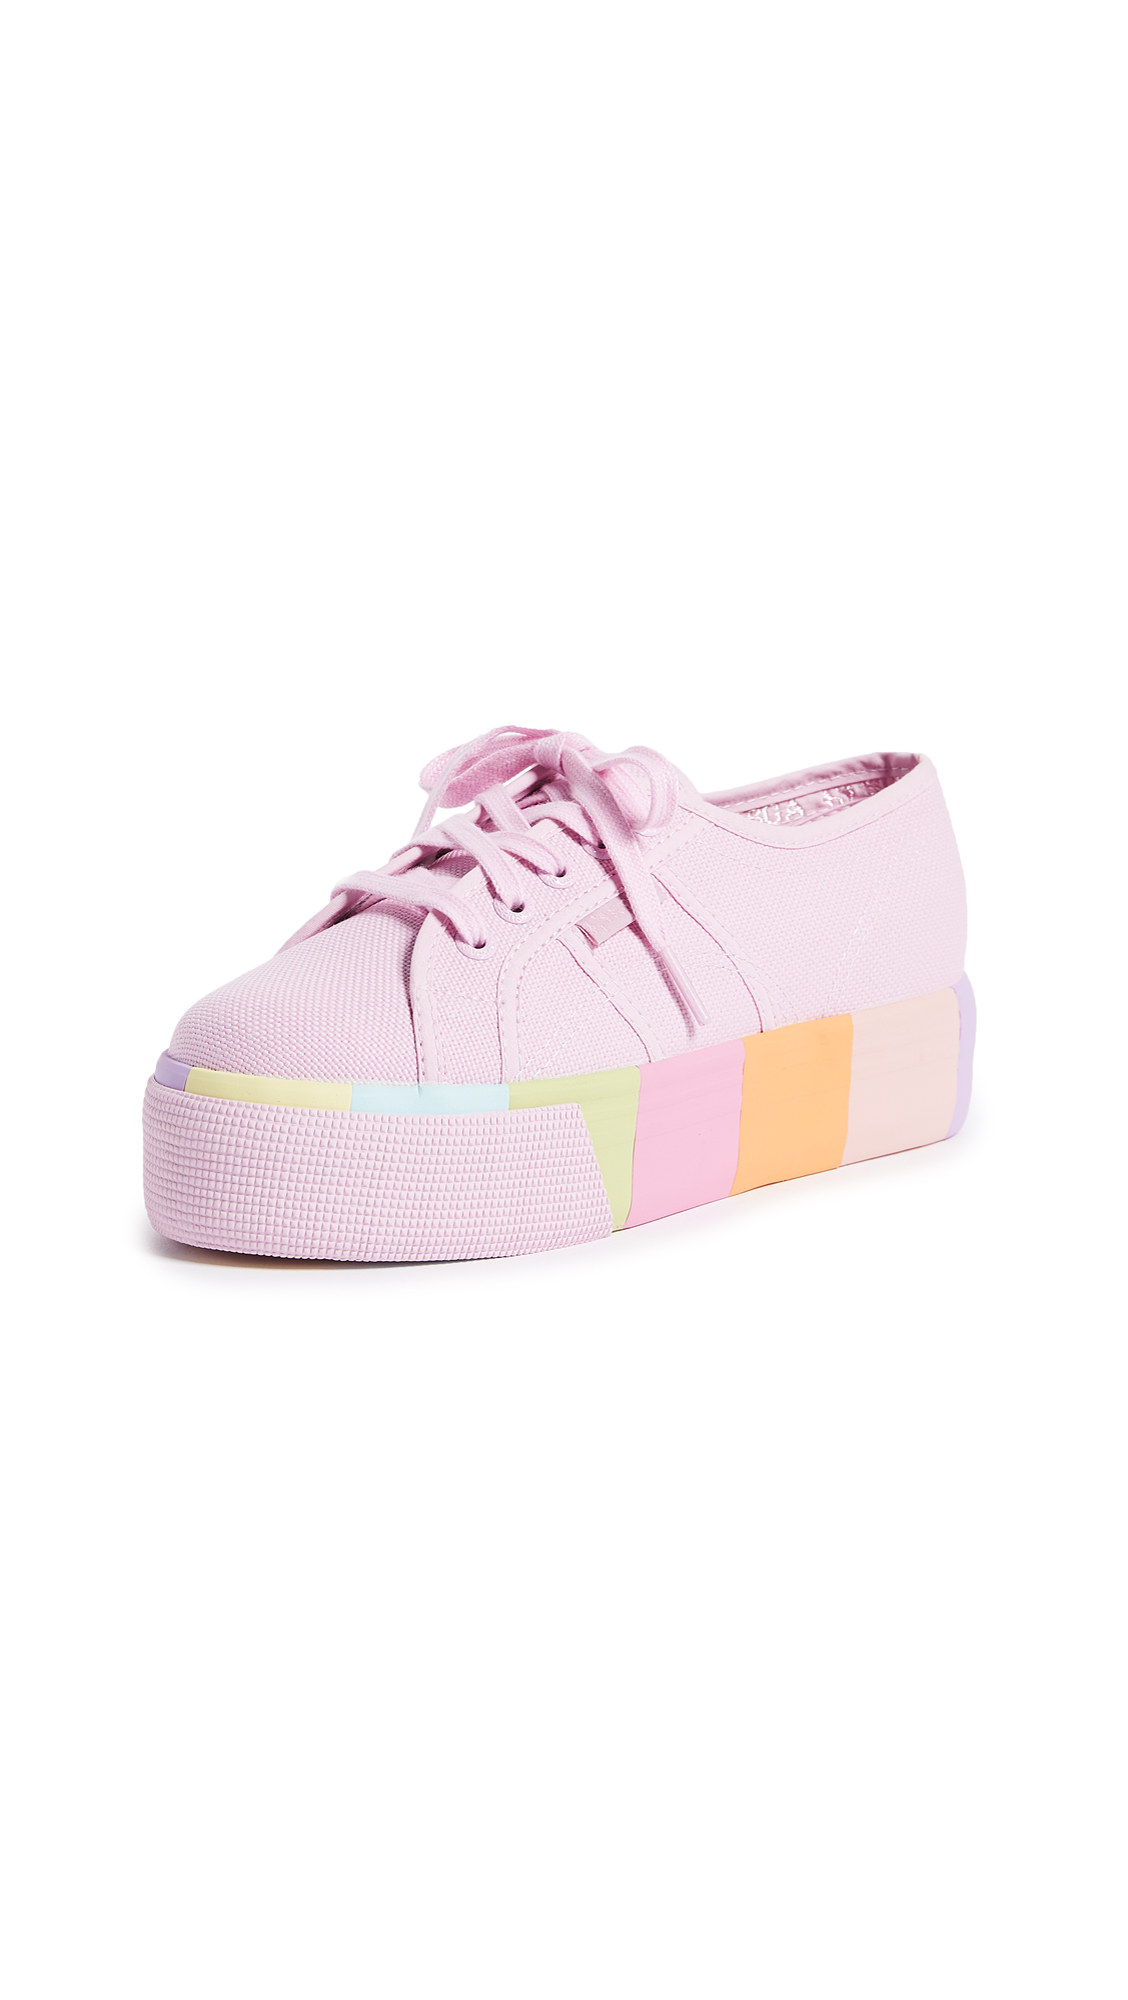 Superga 2790 Multi Platform Sneakers - Pink/Lavender